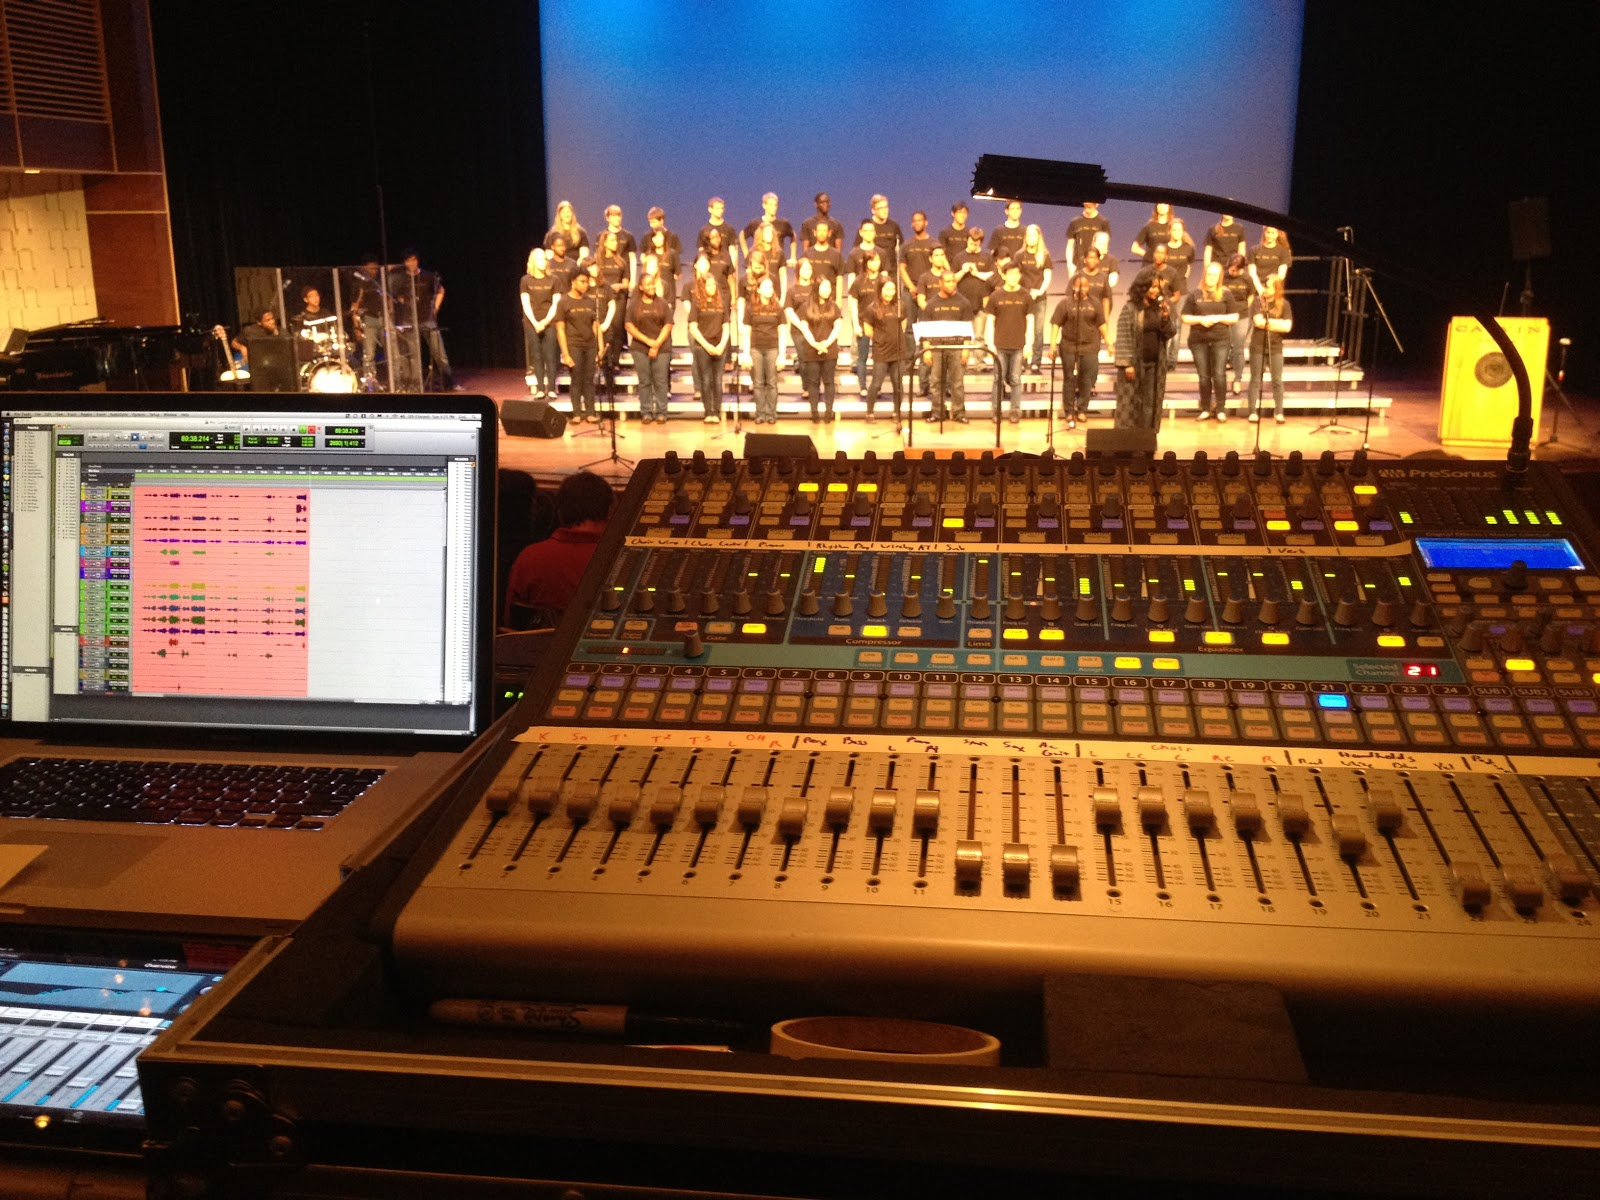 GvG Productions: Live Gospel Choir Sound Reinforcement And